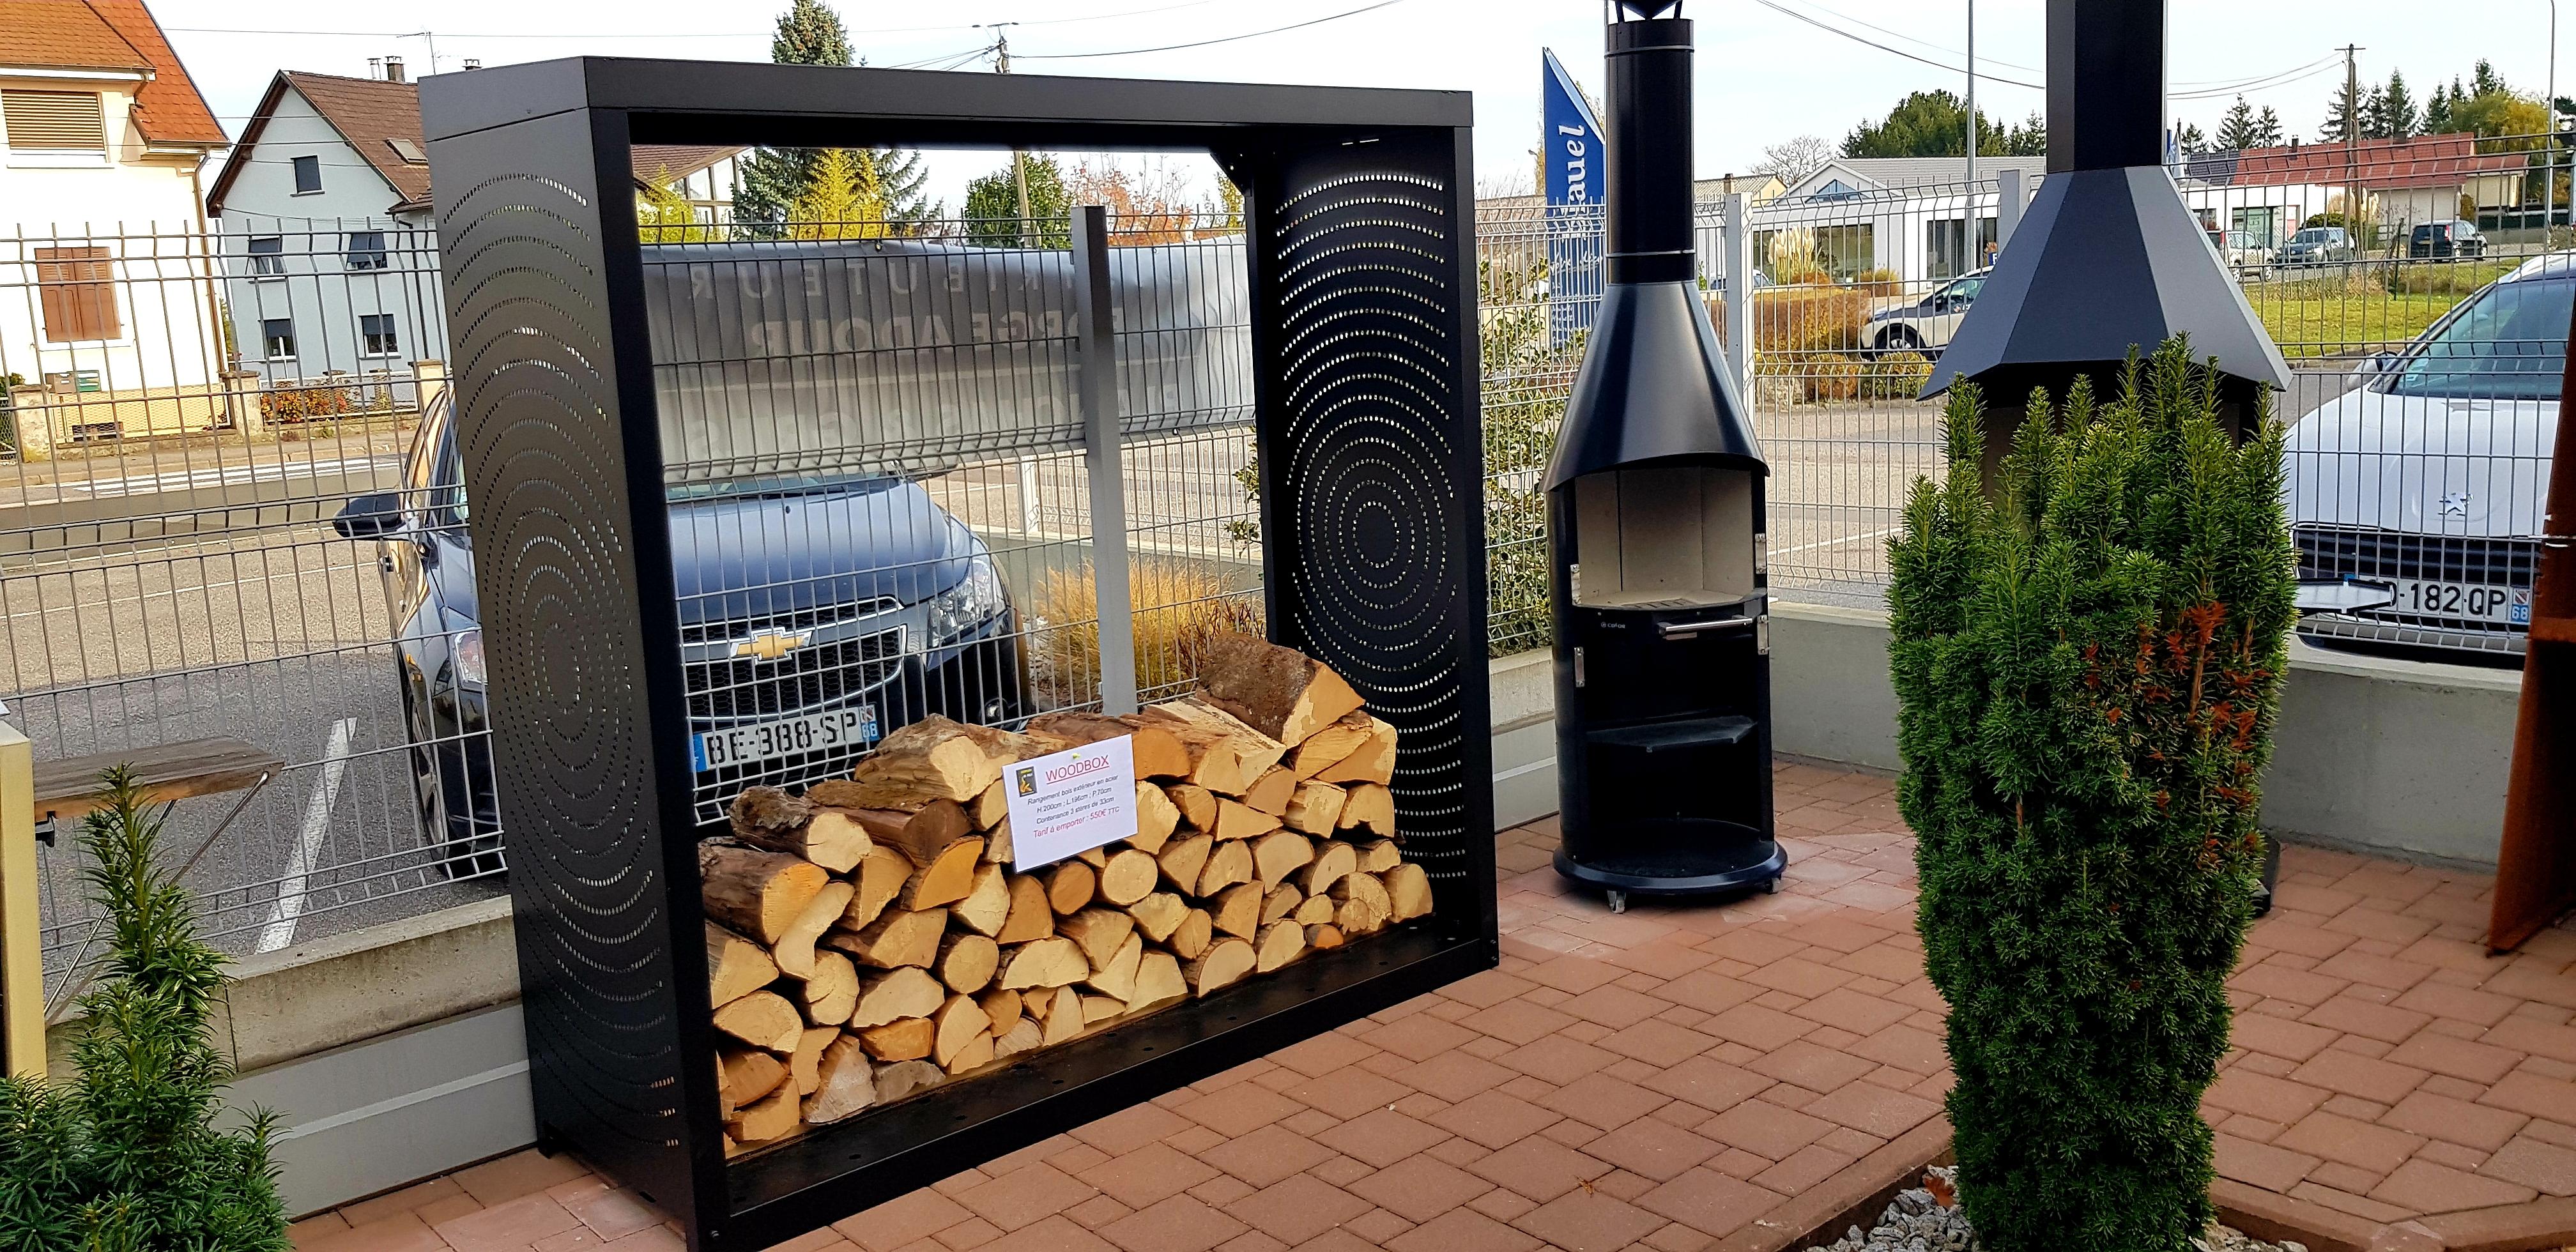 Accessoires Keiflin et Fils : Rangement bois Woodbox